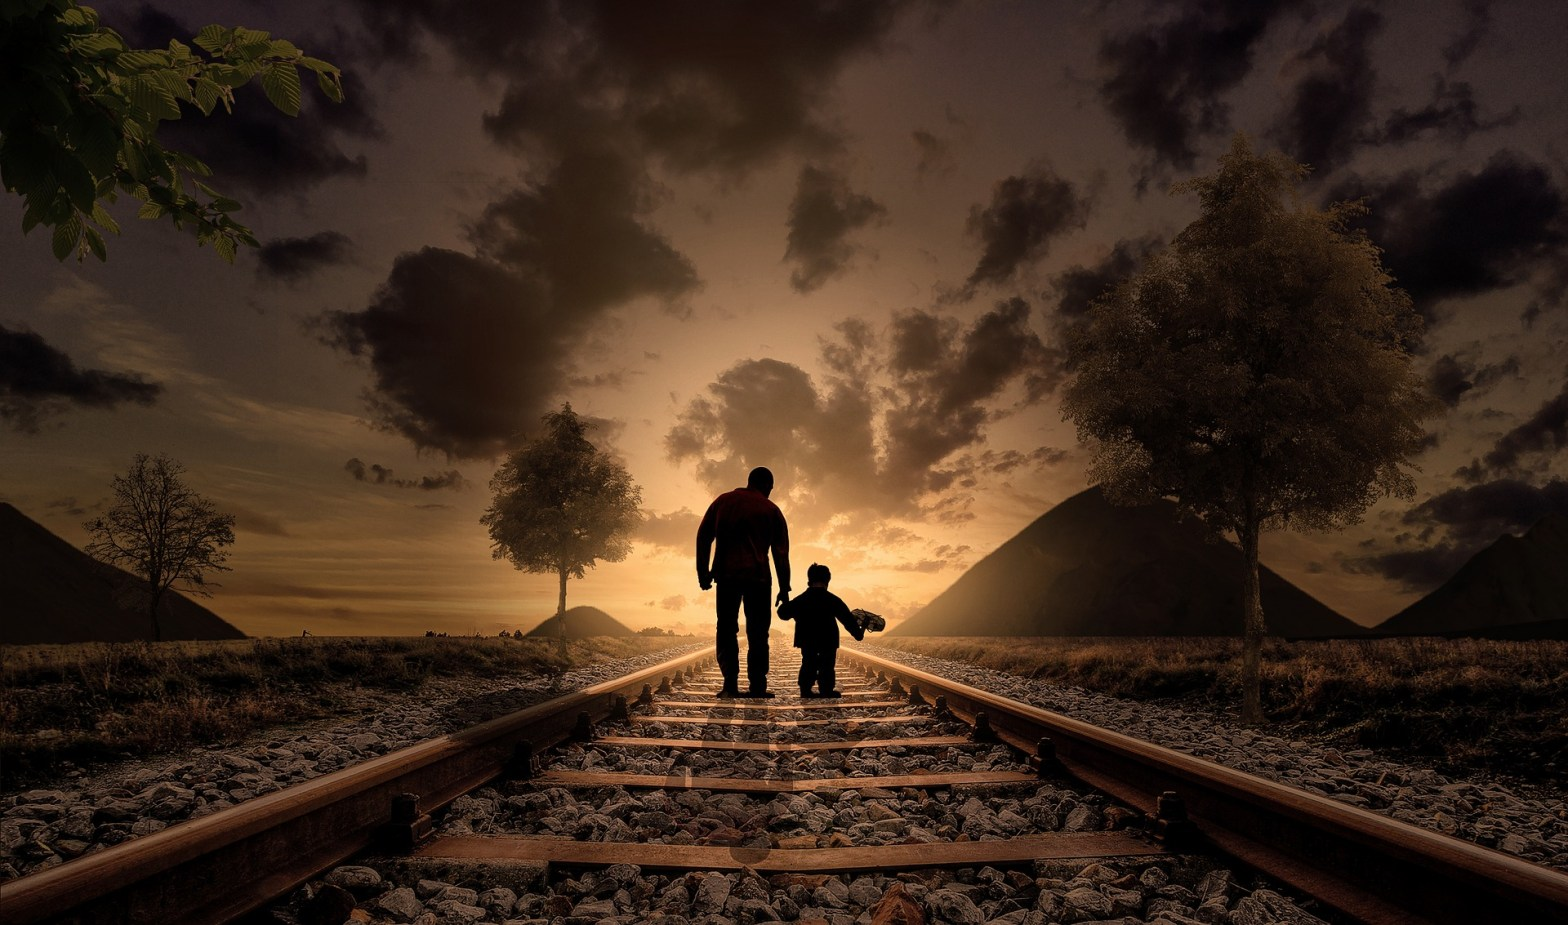 Man walking with child on train tracks